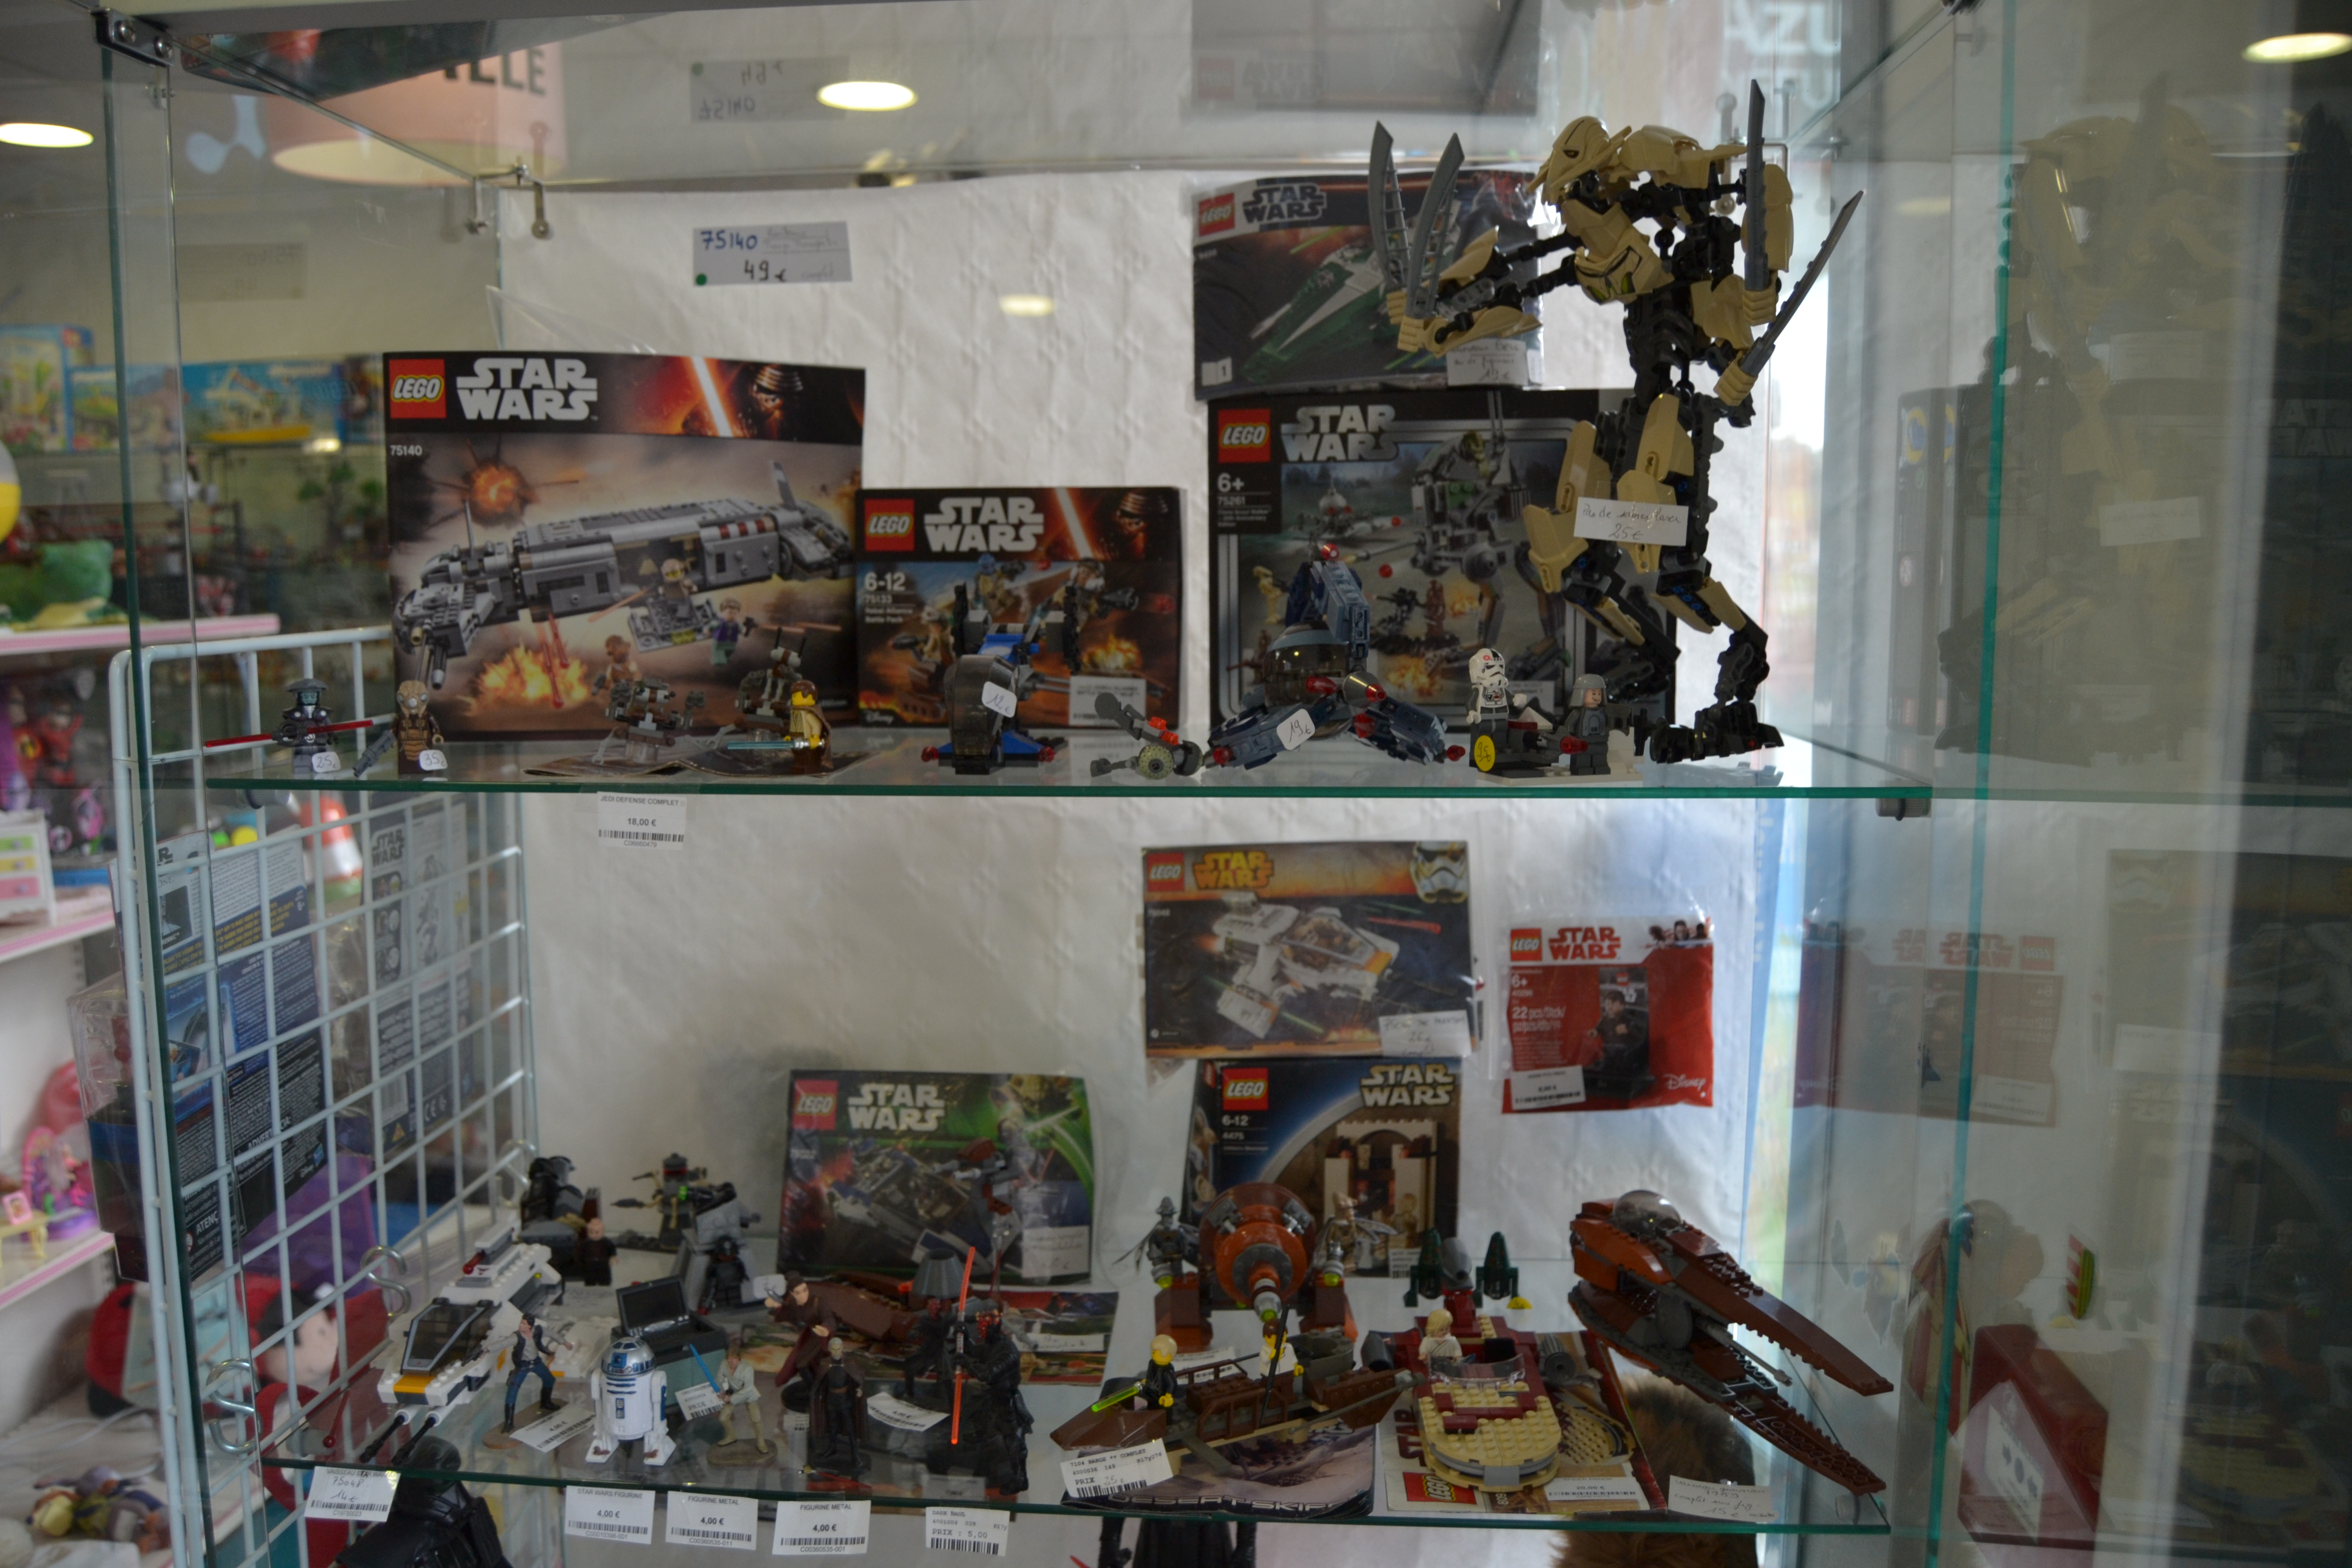 lego star wars locatroc family, lego chima locatroc family, lego pièce détachée locatroc family